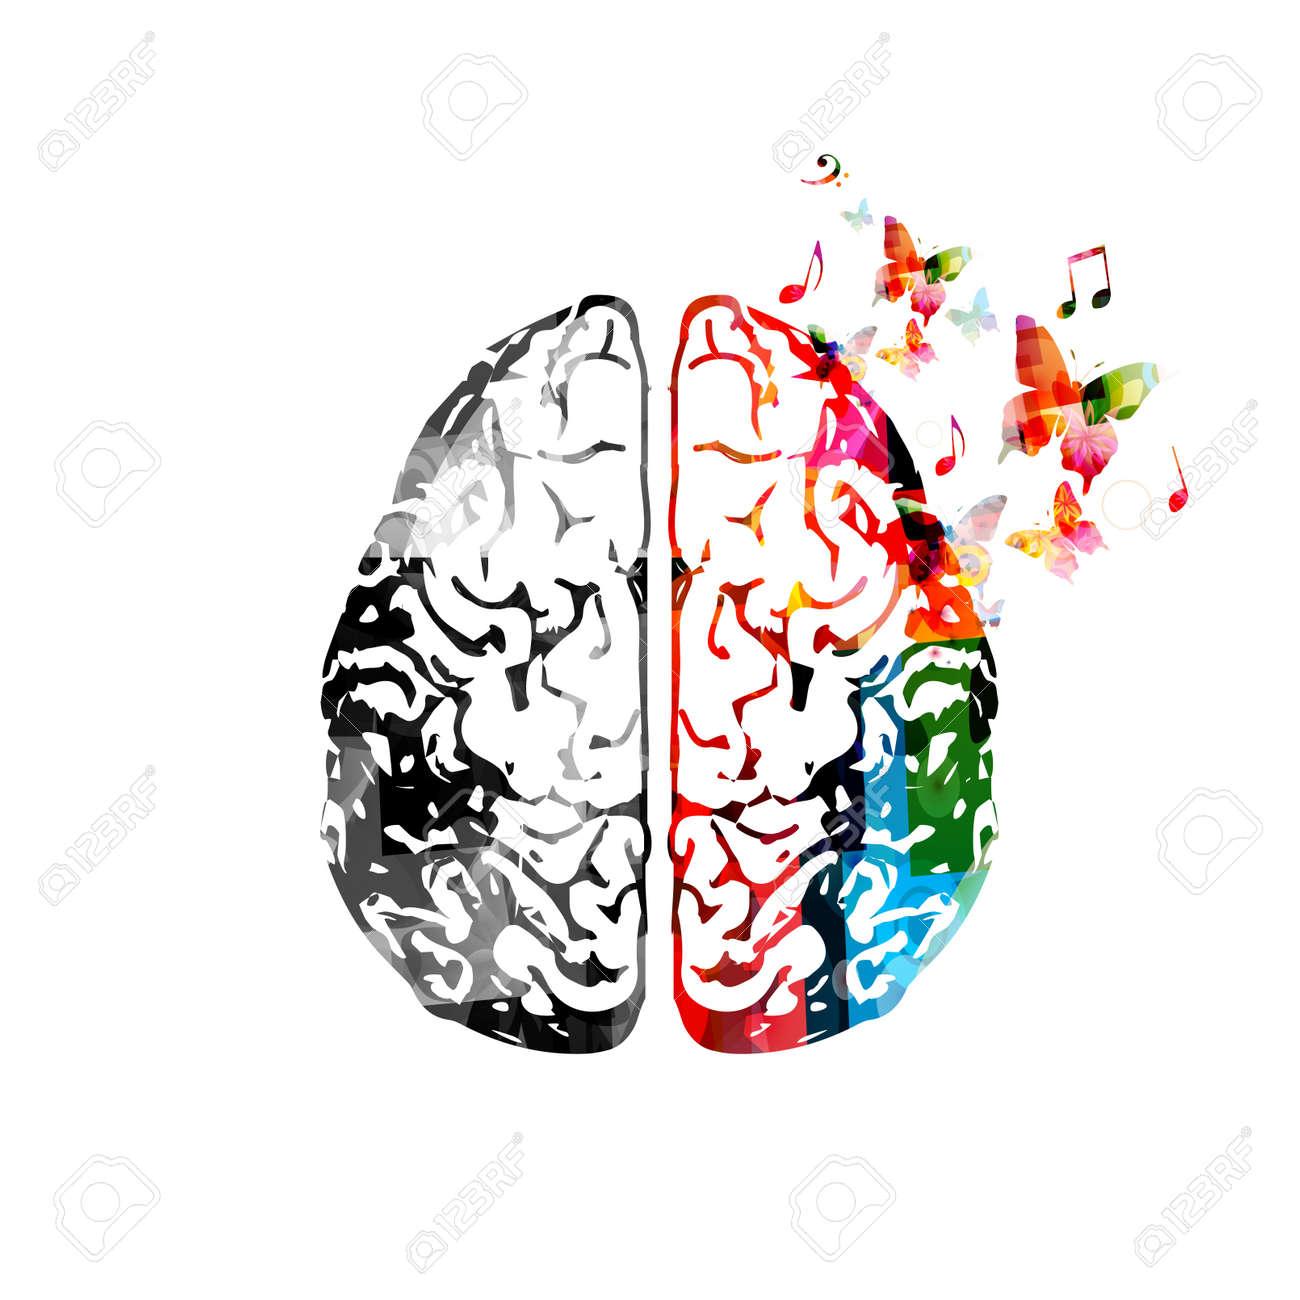 Colorful human brain illustration. - 85980662